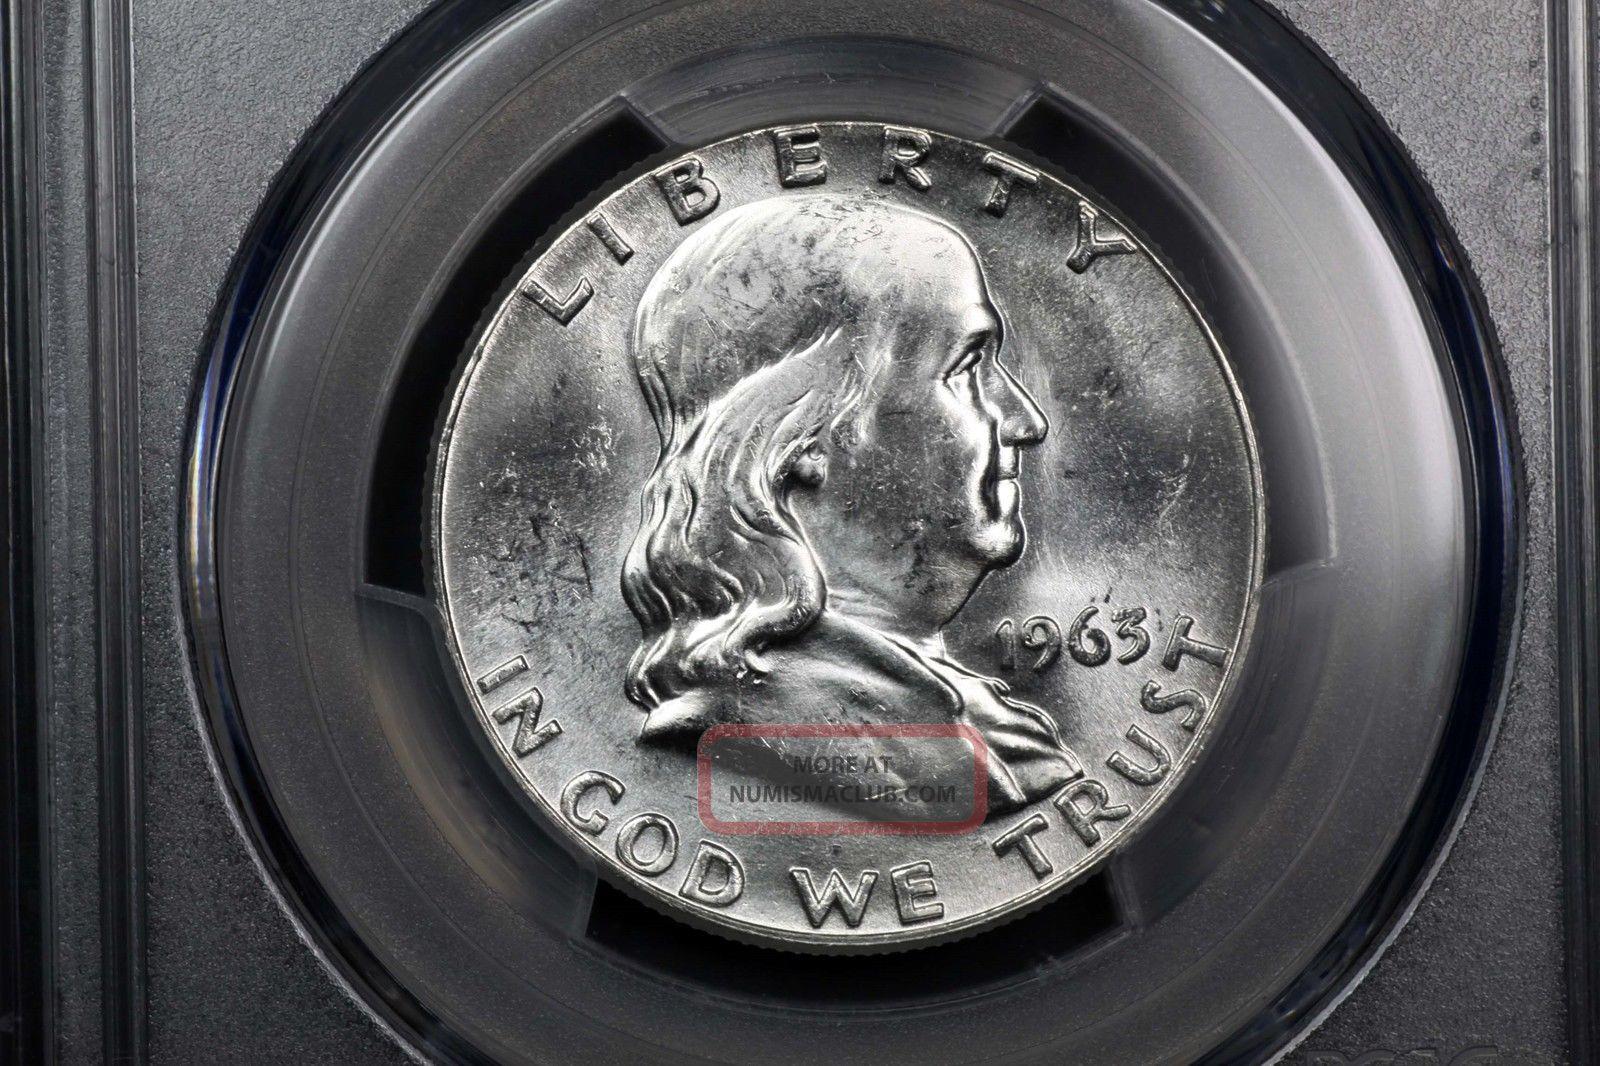 1963 Franklin Silver 50c Ms 64 Pcgs 84366456 Franklin (1948-63) photo